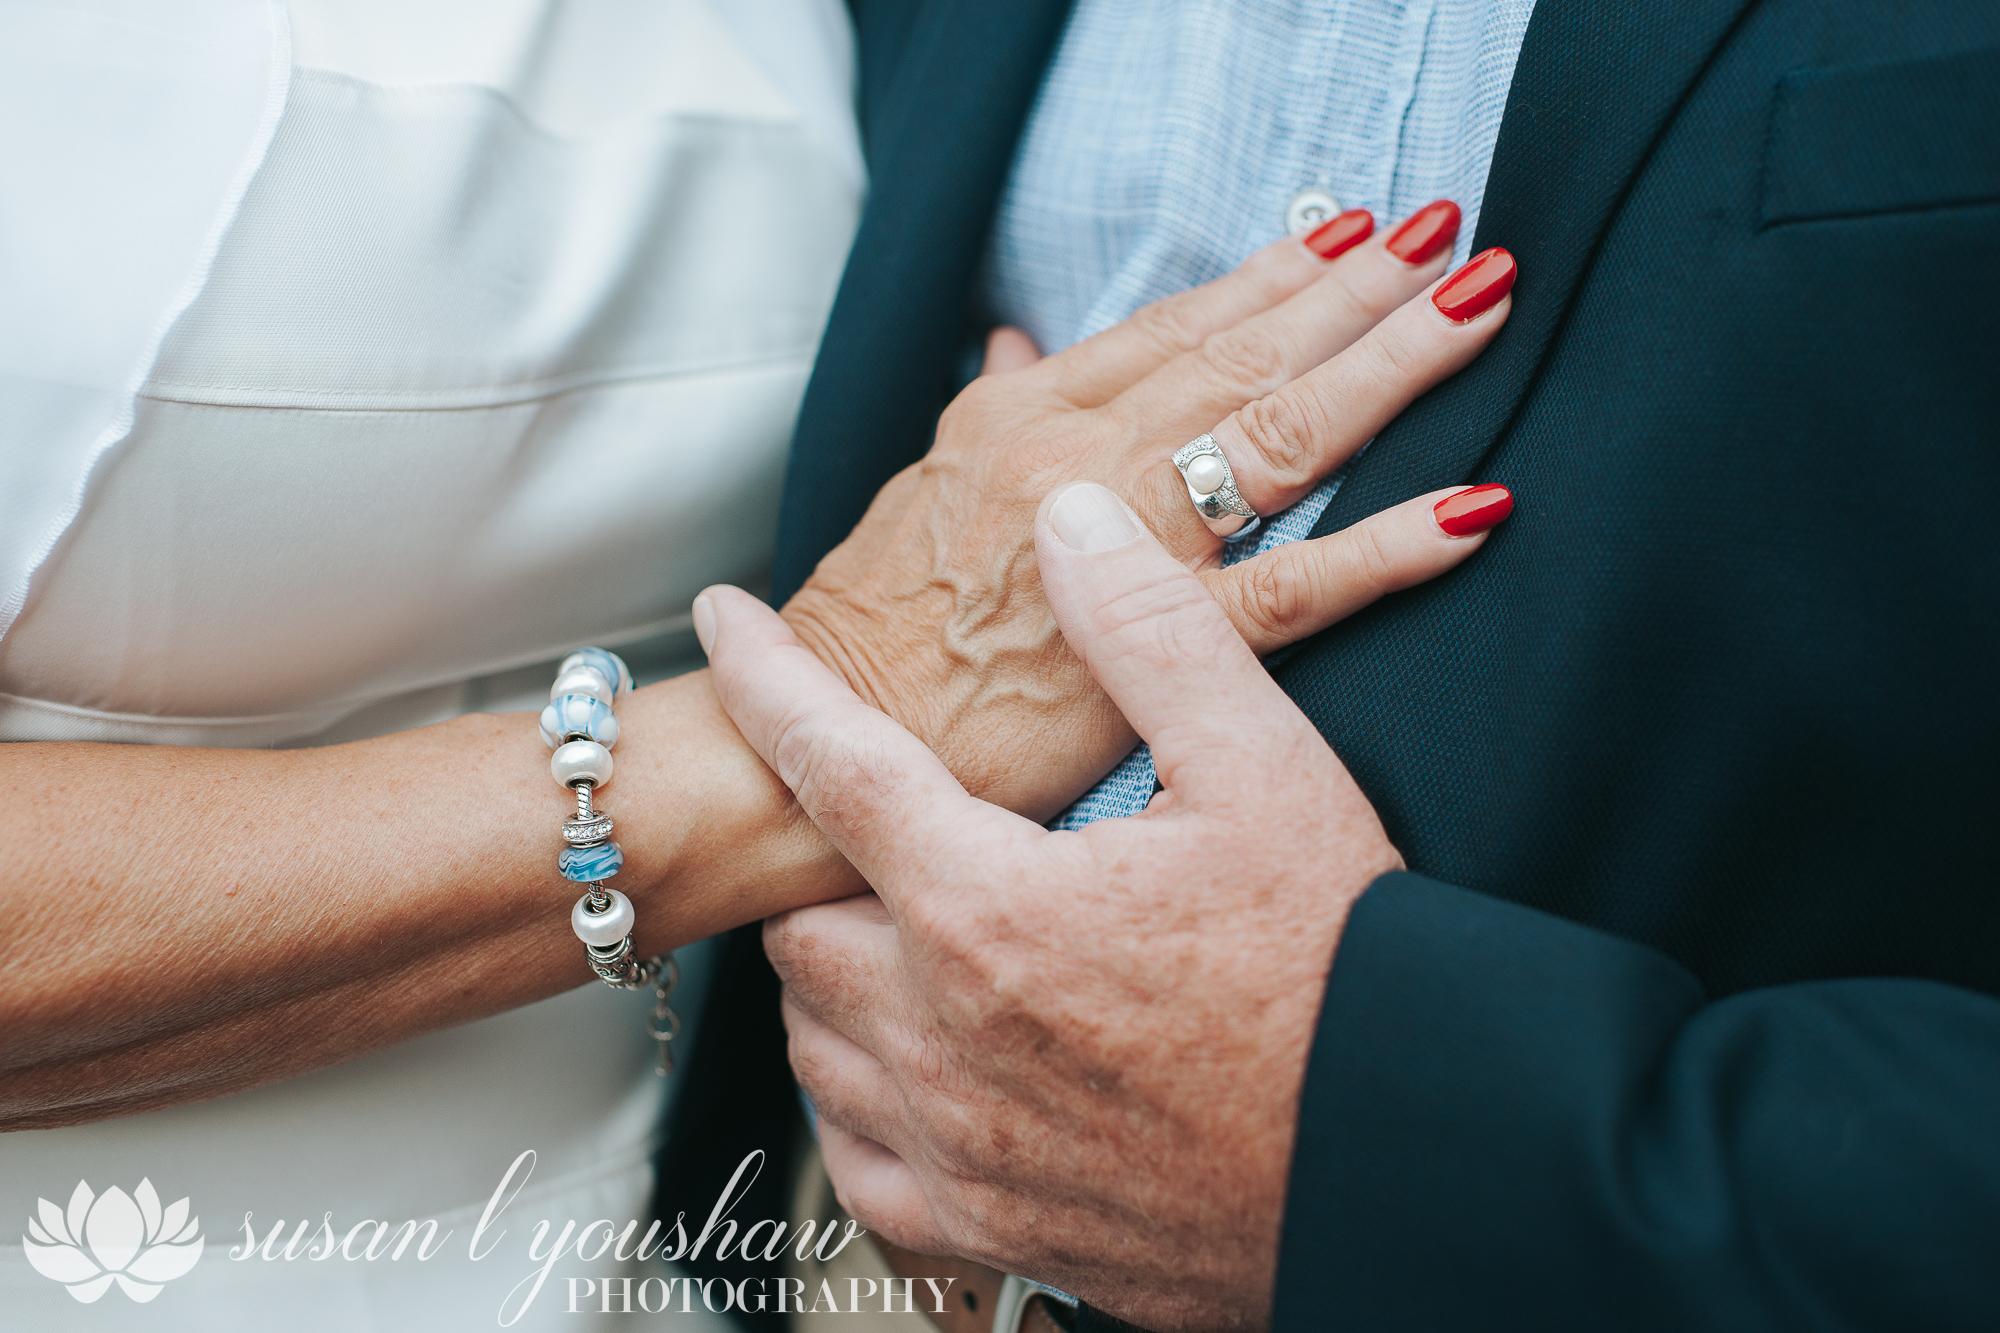 BLOG Carolyn Adams and Jim McCune 07-04-2018 SLY Photography-30.jpg